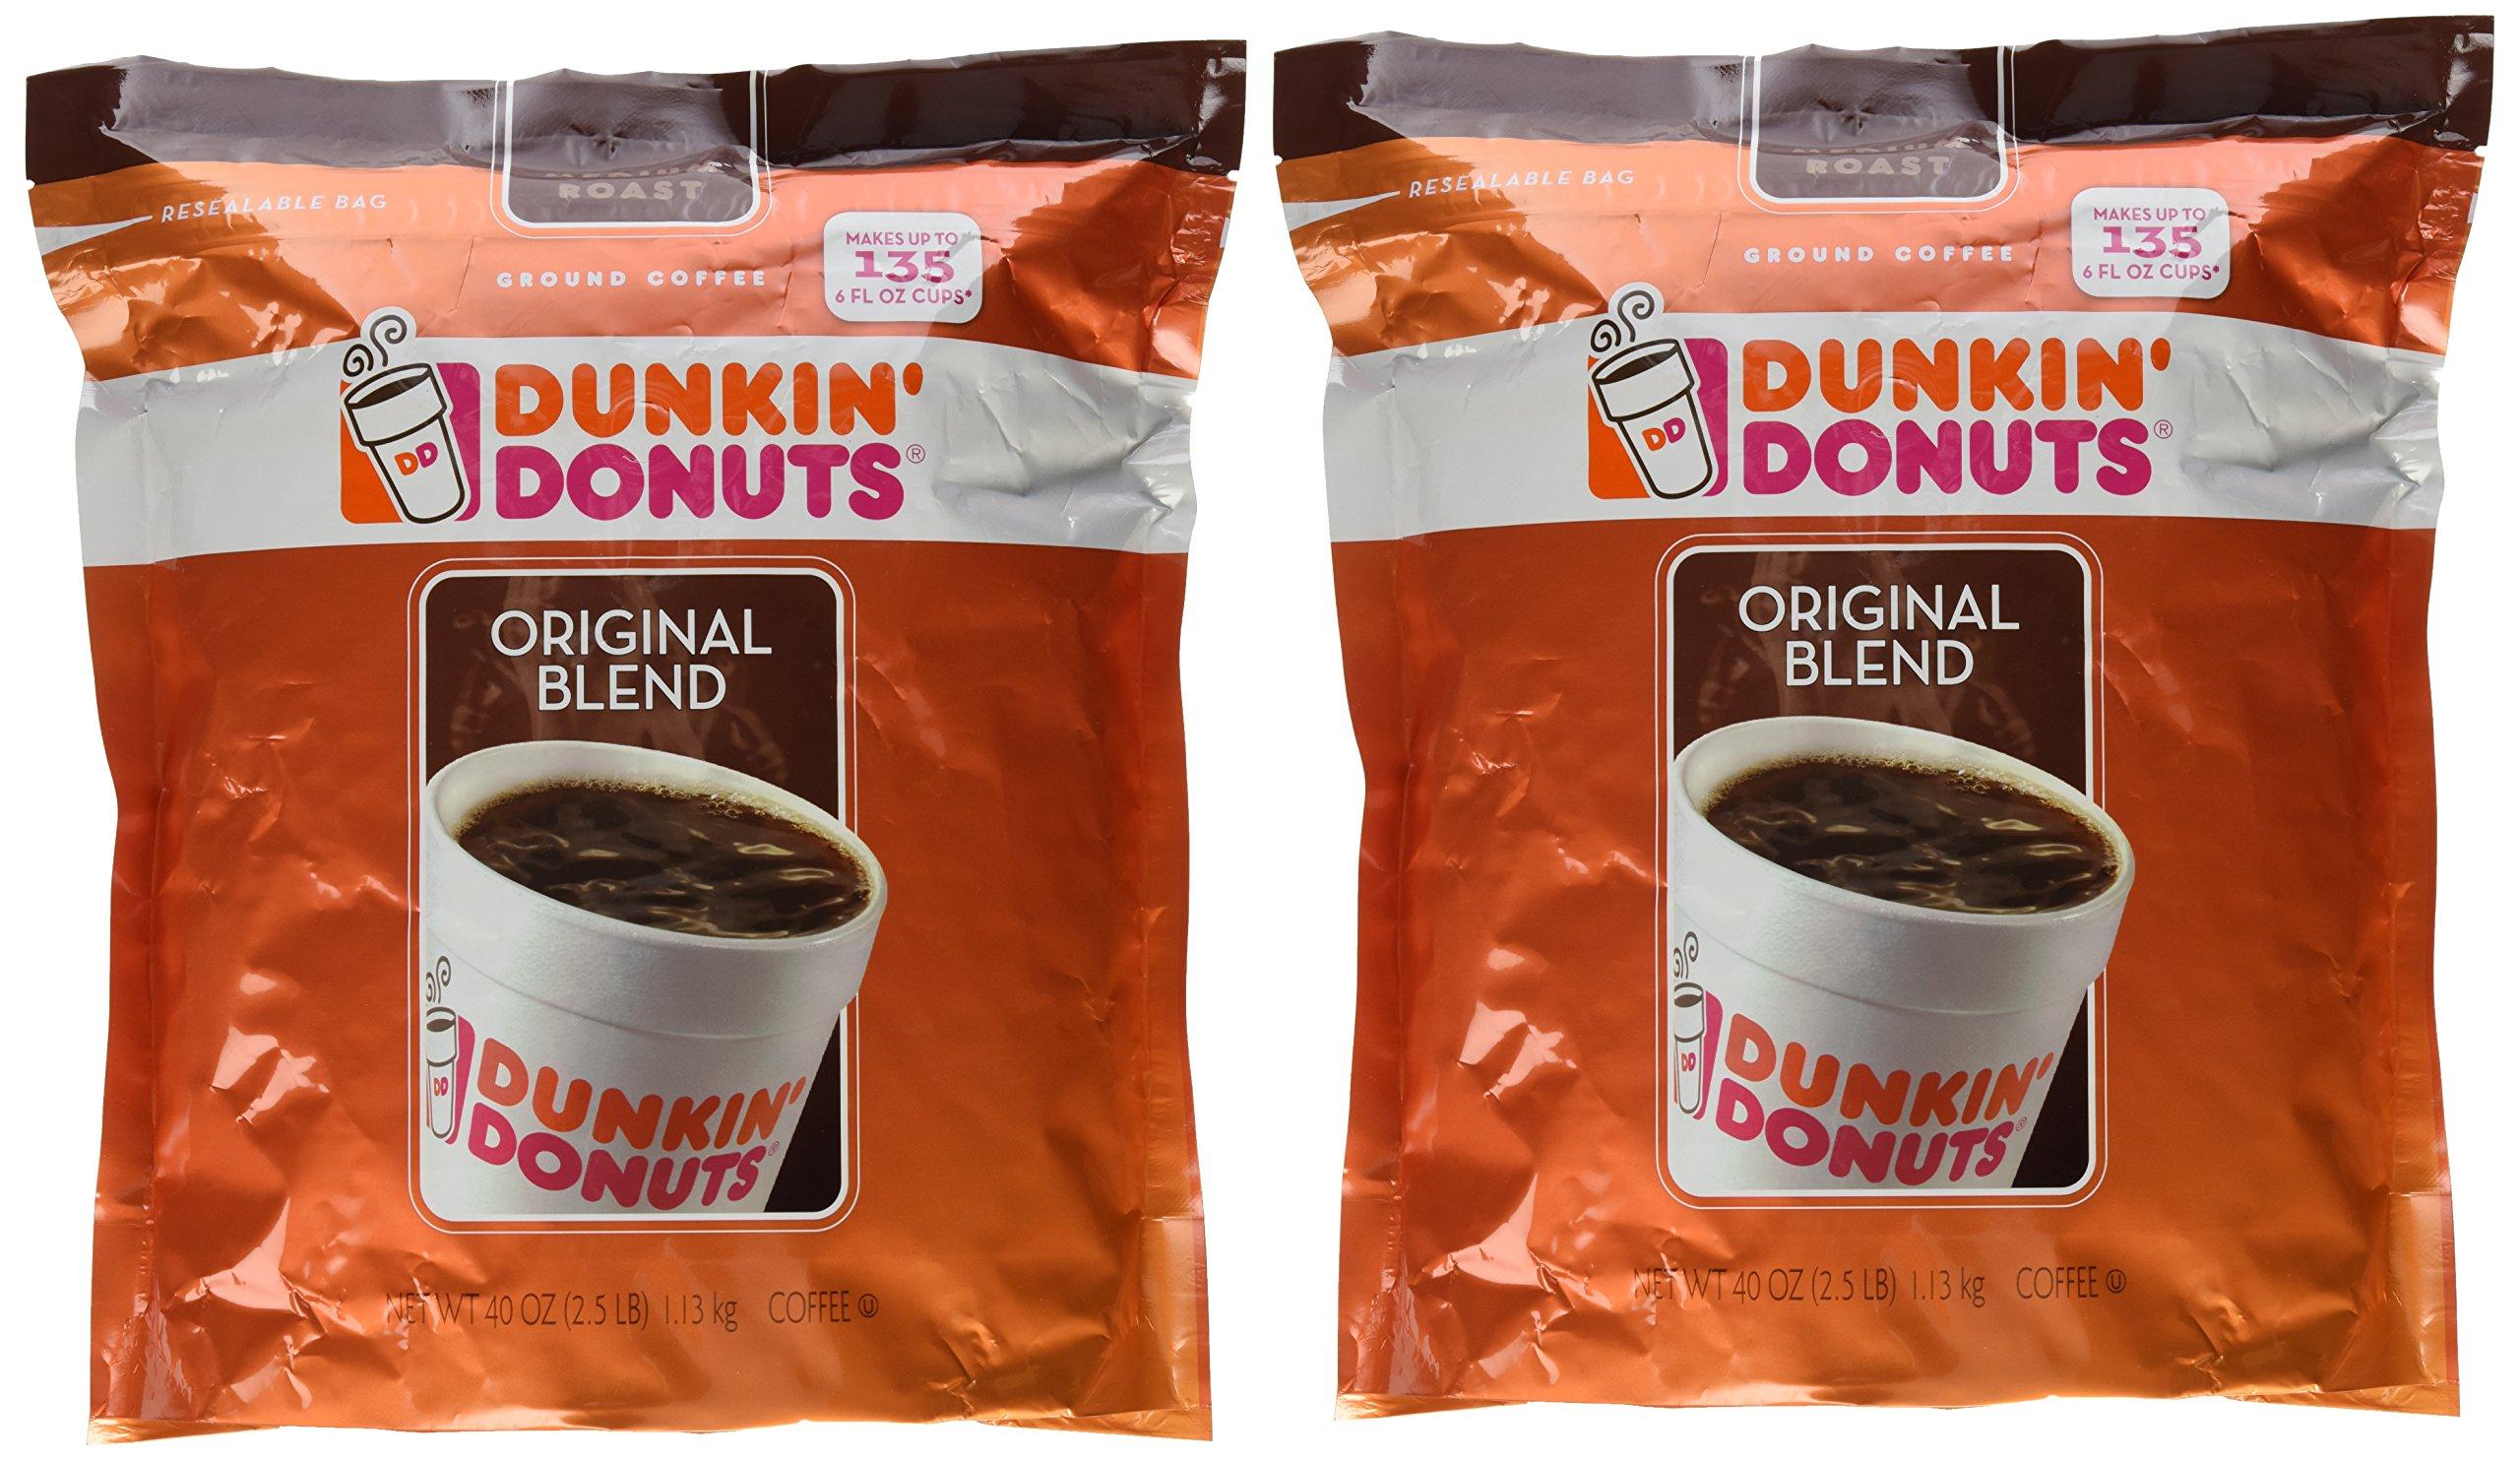 Dunkin' Donuts Original Blend Medium Roast Ground Coffee 100 % Premium Arabica Coffee 40 oz. (Pack of 2) by Dunkin' Donuts